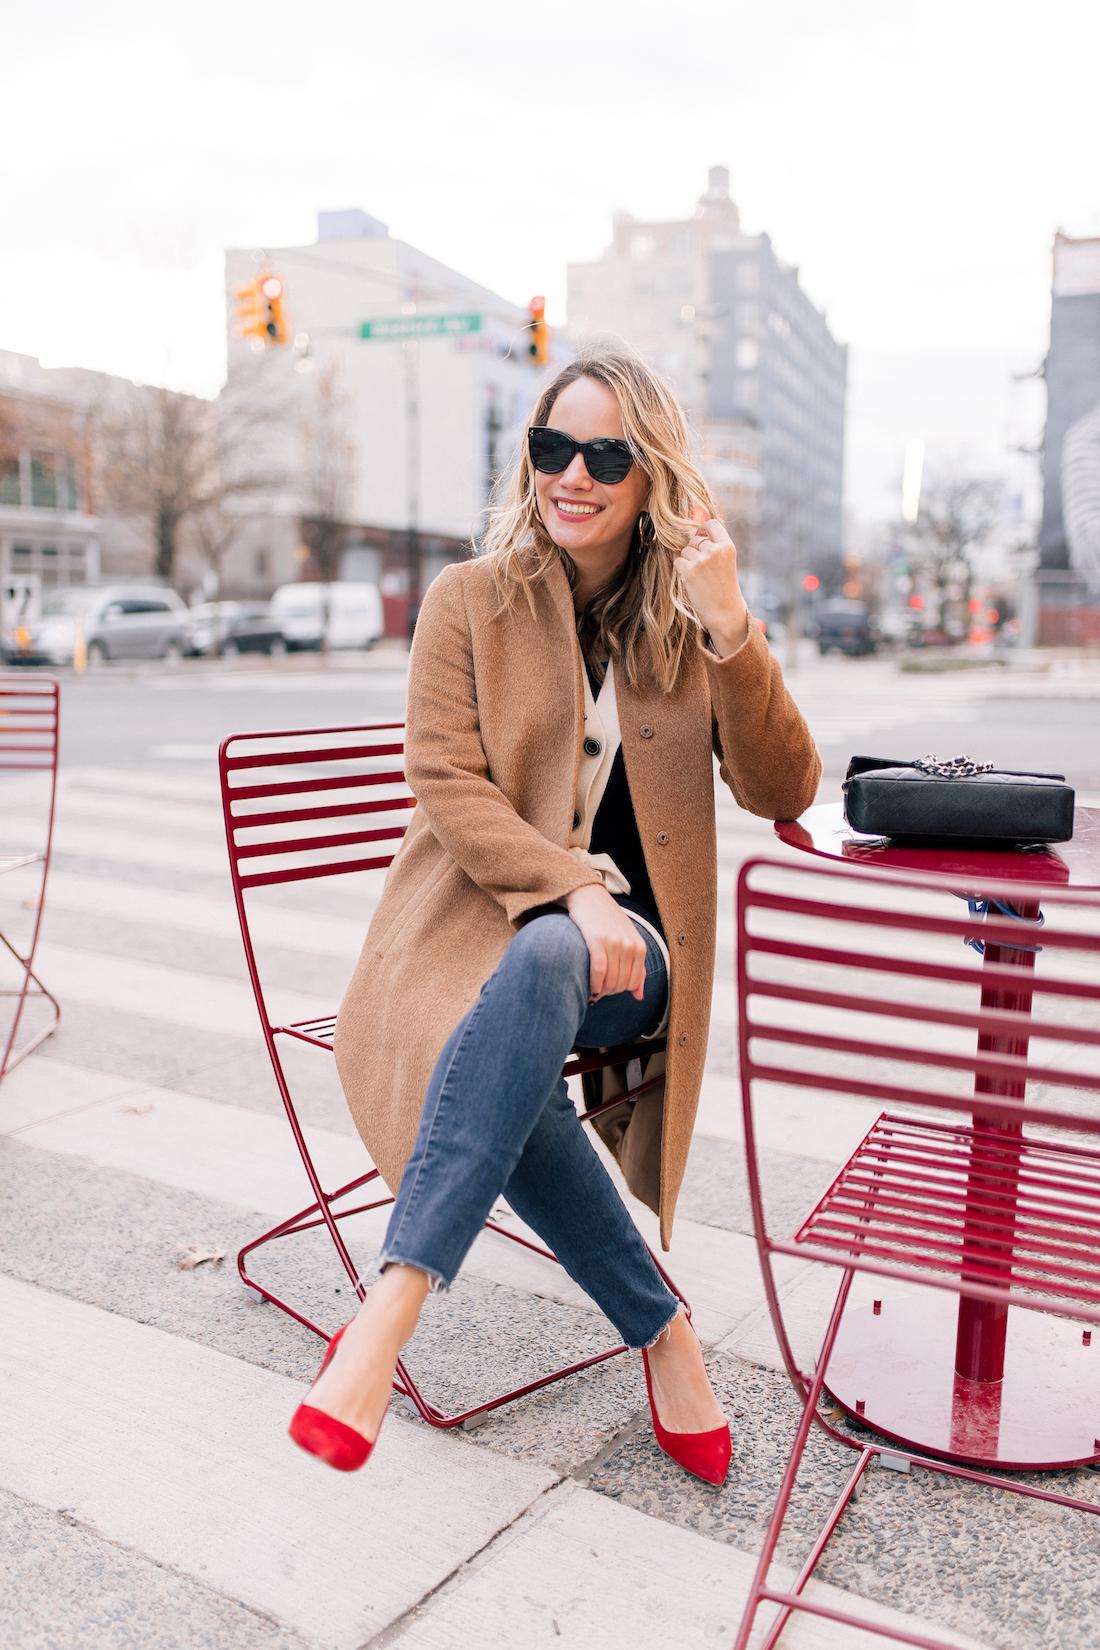 Grace Atwood Outfit Details:Eileen Fisher Coat // White & Warren Cardigan // Good American Jeans // Polaroid Sunglasses // Chanel Purse// Manolo Blahnik Heels